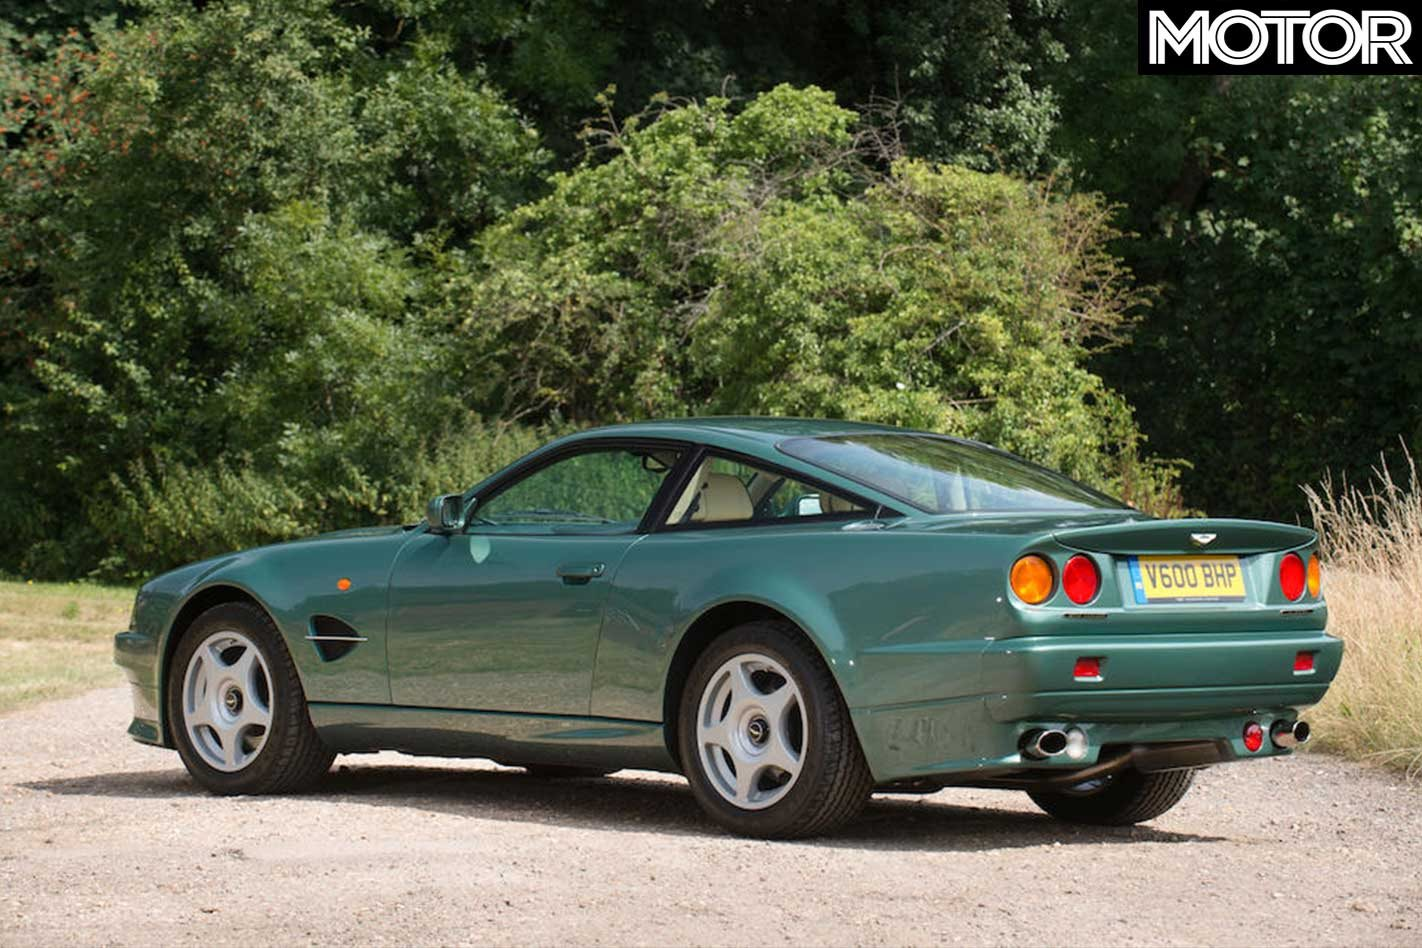 1998 2000 Aston Martin V600 Le Mans Fast Car History Lesson